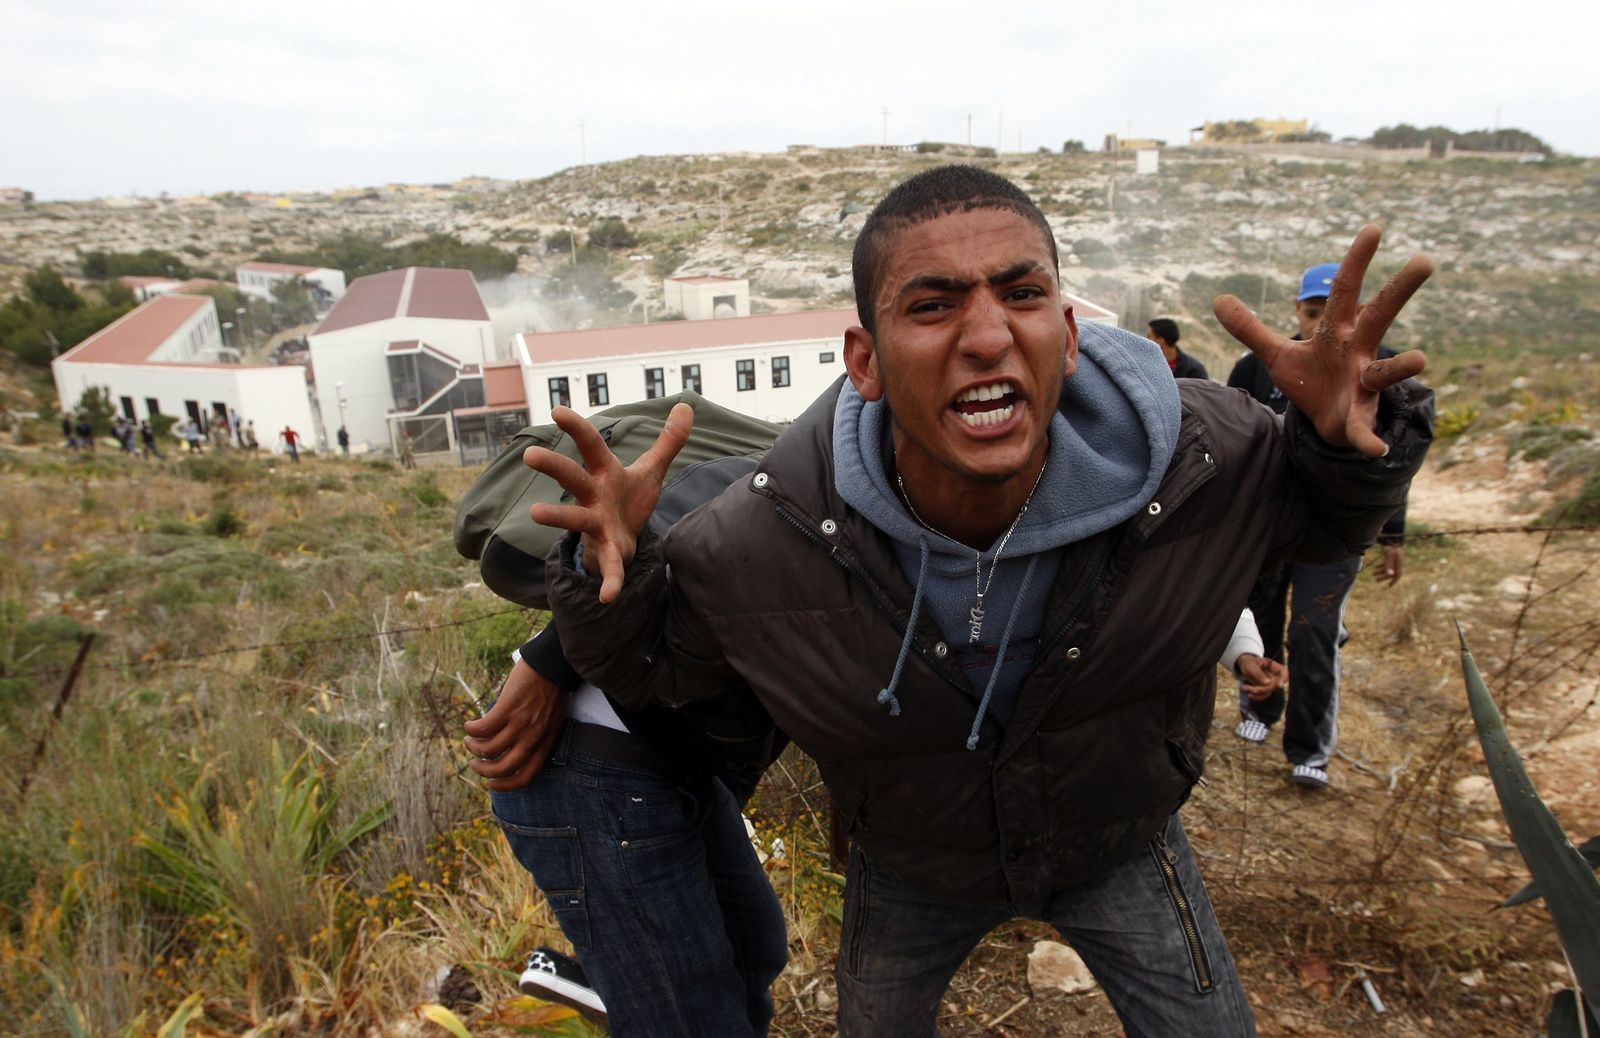 Tunisian Immigrant Lampedusa